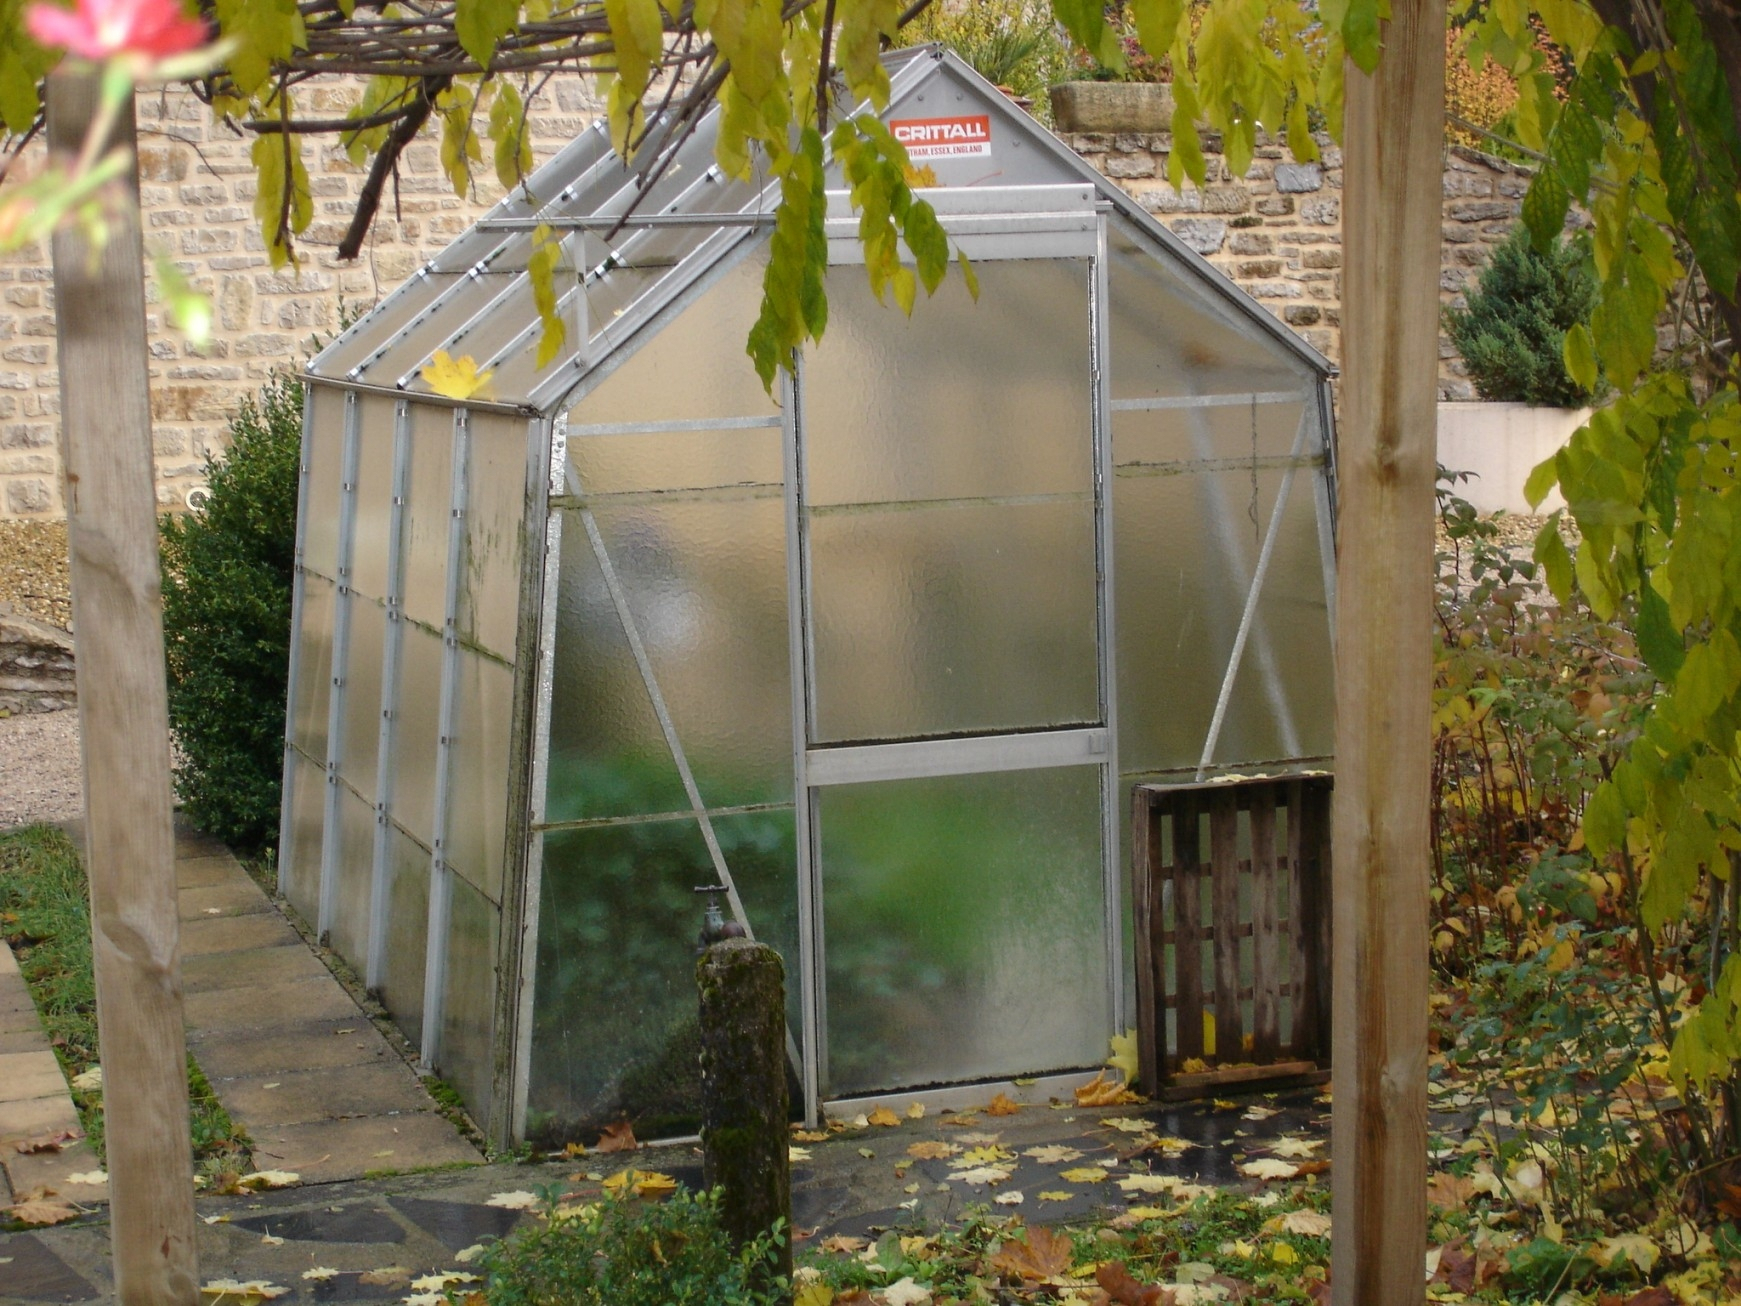 Serre De Jardin Le Bon Coin - Veranda Et Abri Jardin destiné Abri De Jardin Le Bon Coin